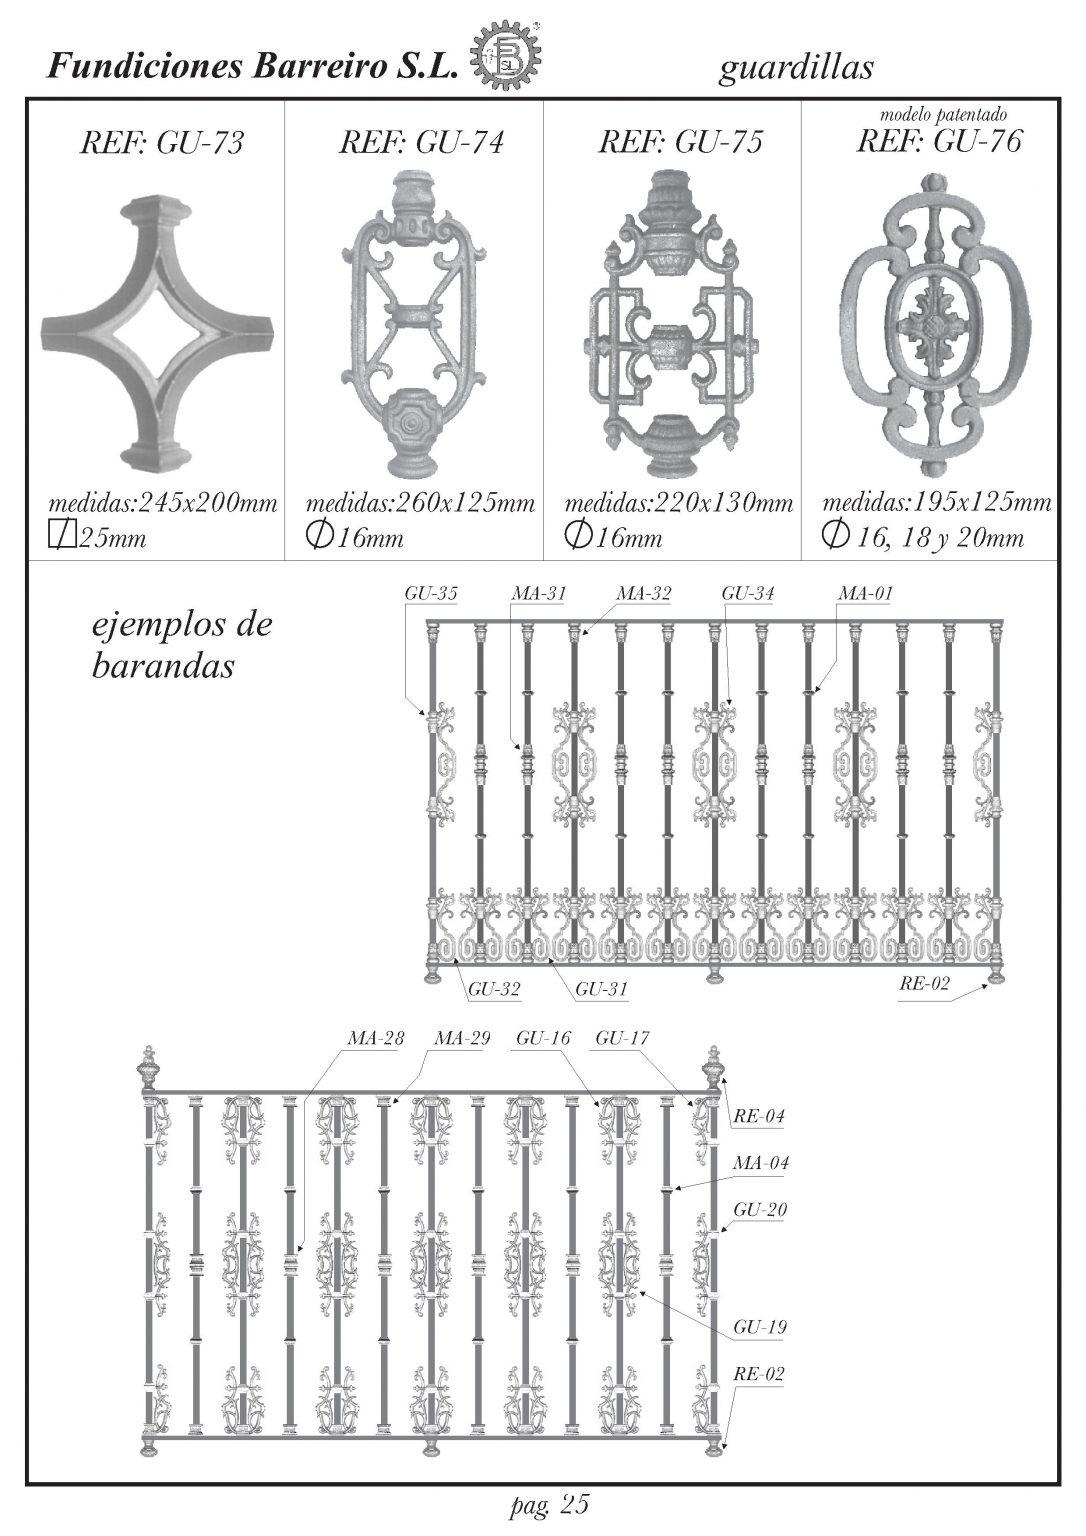 FUNDICIONES BARREIRO-CATALOGO IV-27